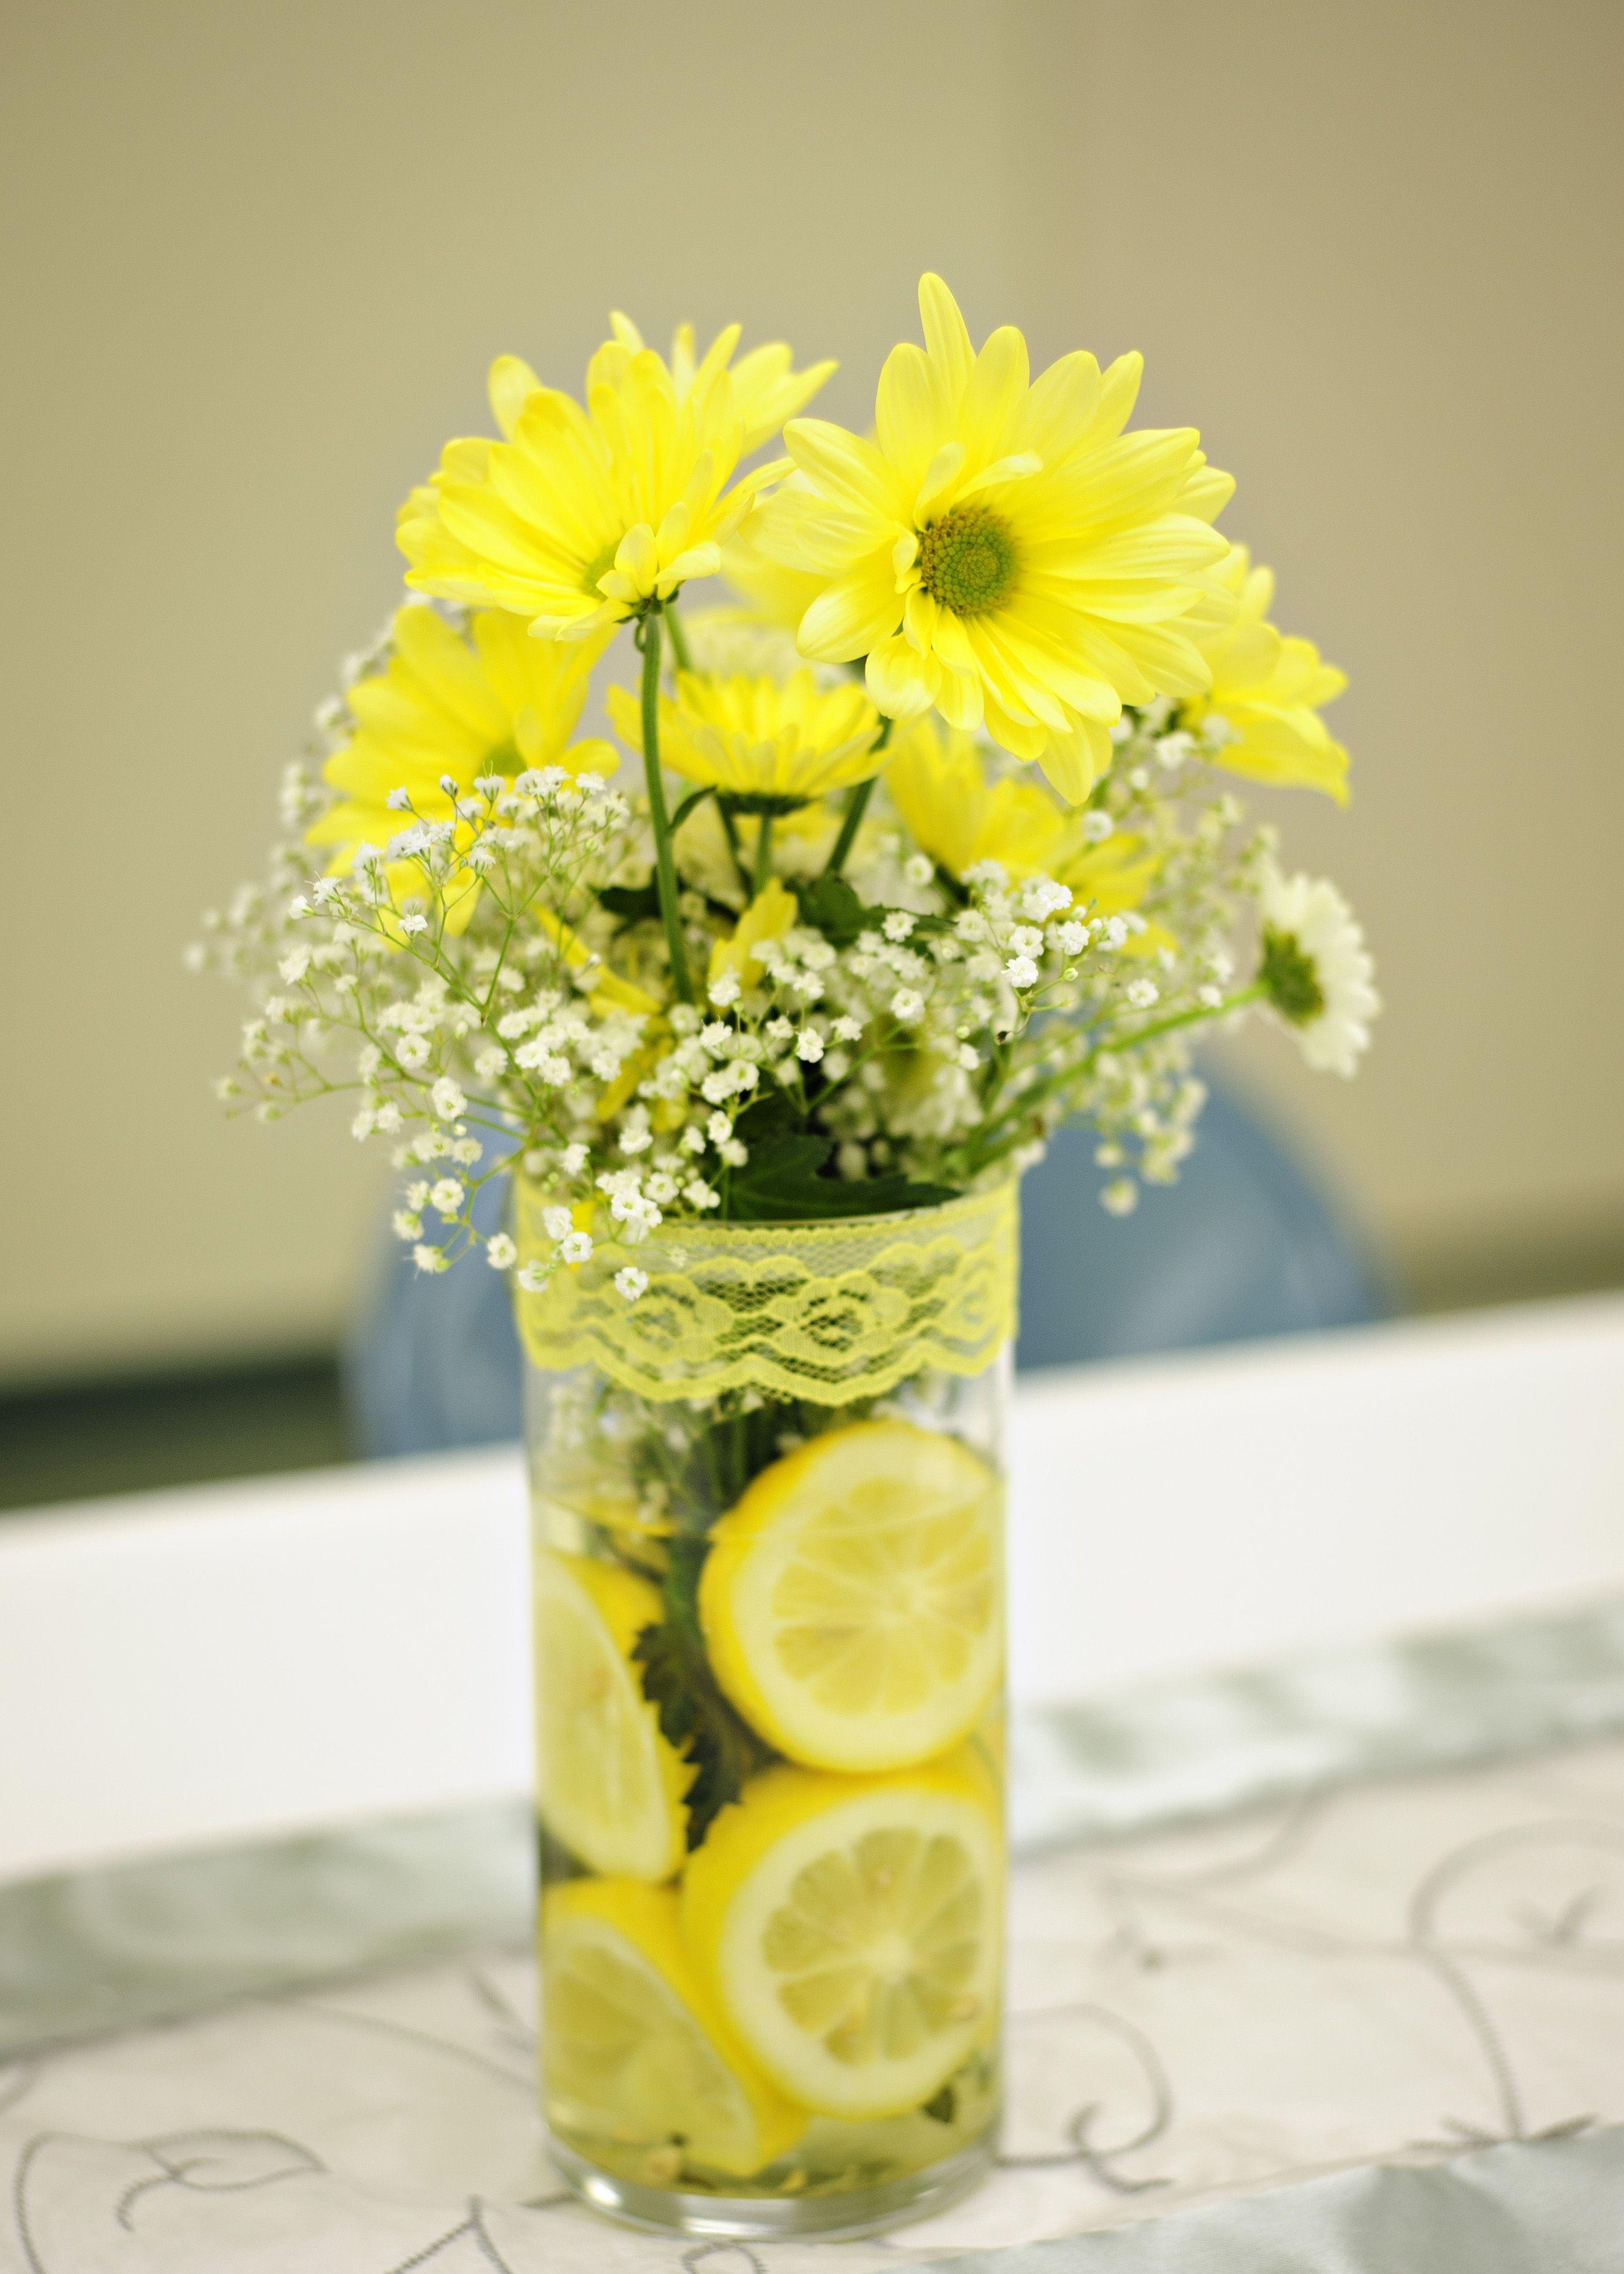 Daisies w/Lemons in vase Table decorations, Flowers, Decor